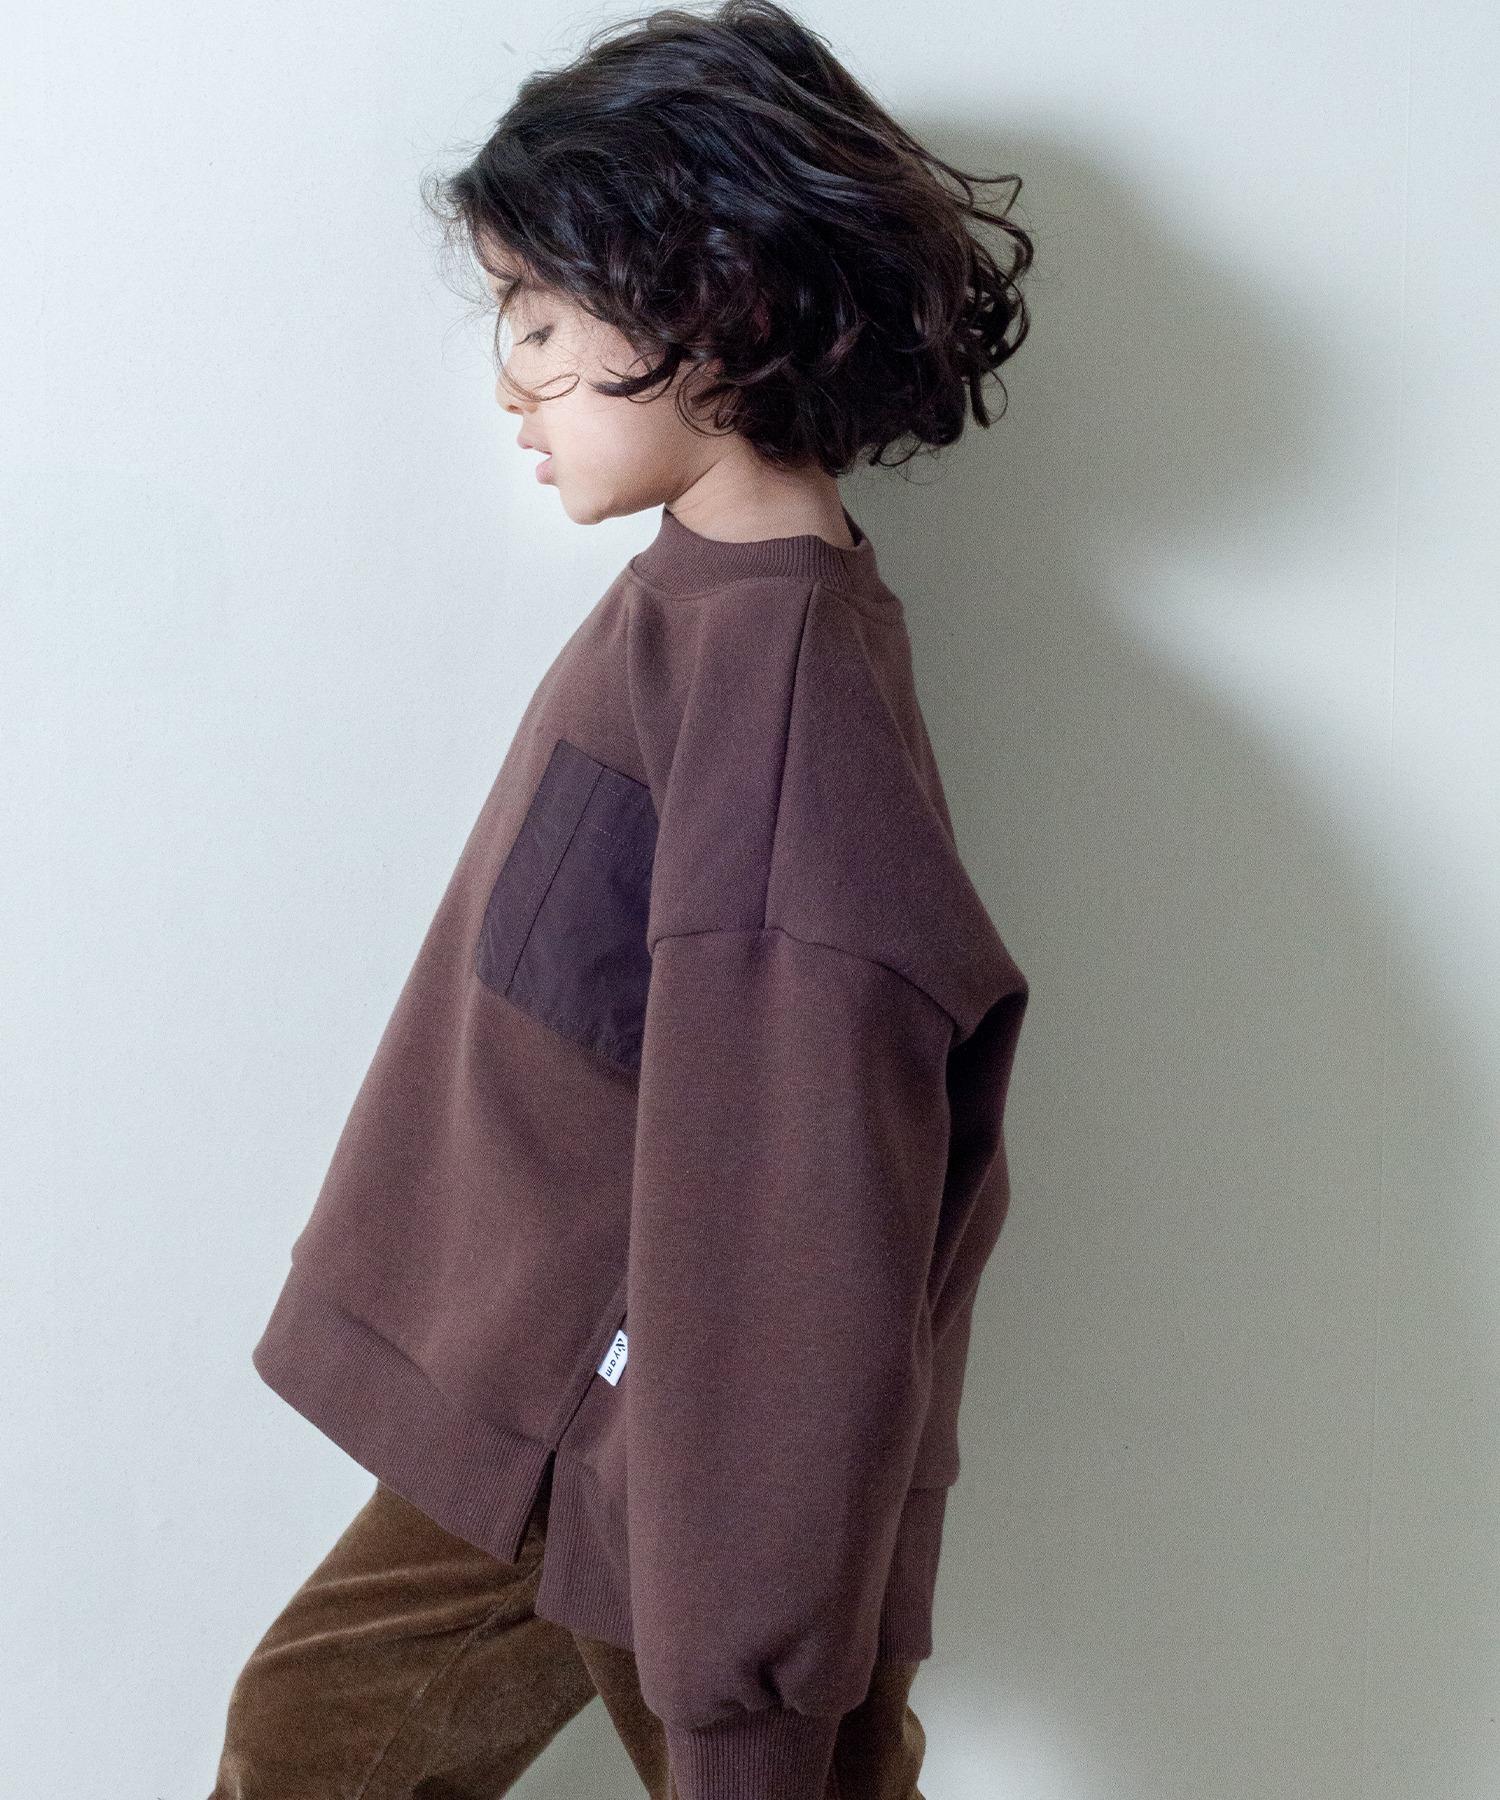 【&yam】異素材ポケット&サイドスリット入りドロップショルダー裏起毛スウェット